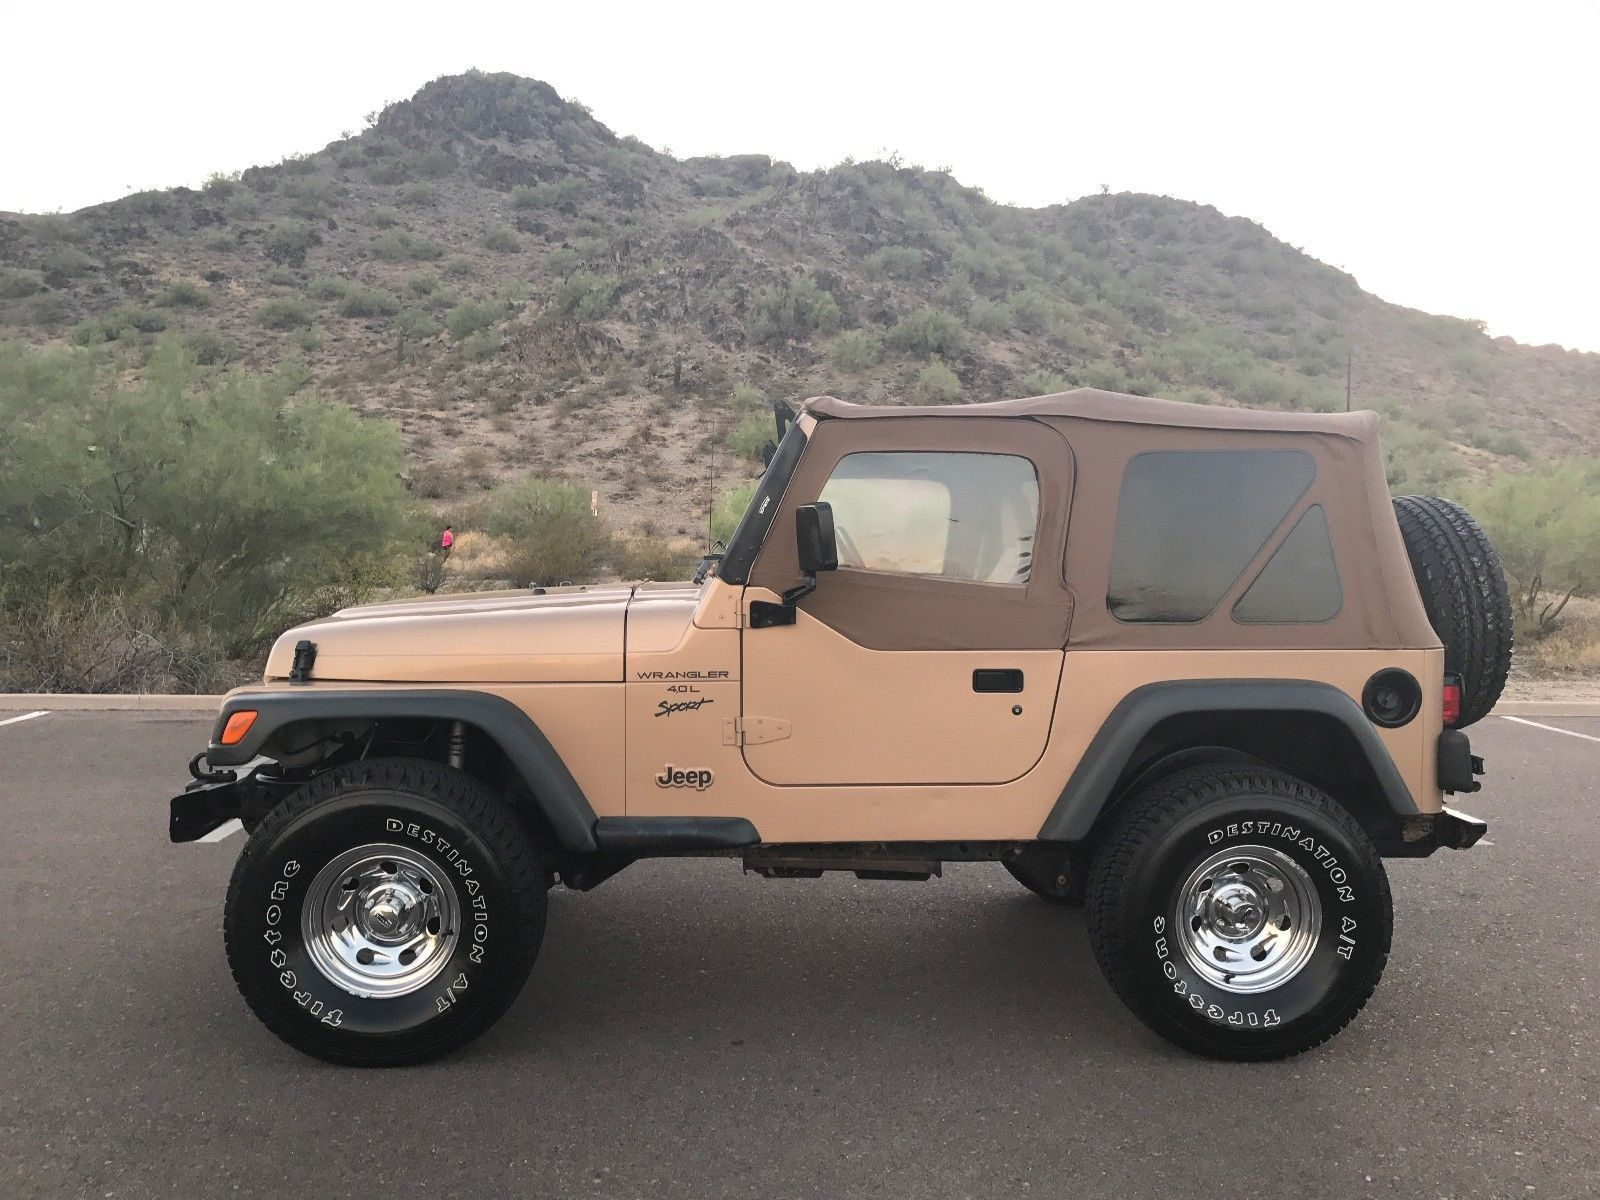 EBay: 1999 Jeep Wrangler 1999 Jeep Wrangler Sport 4.0L TJ Manual RUST FREE  AZ